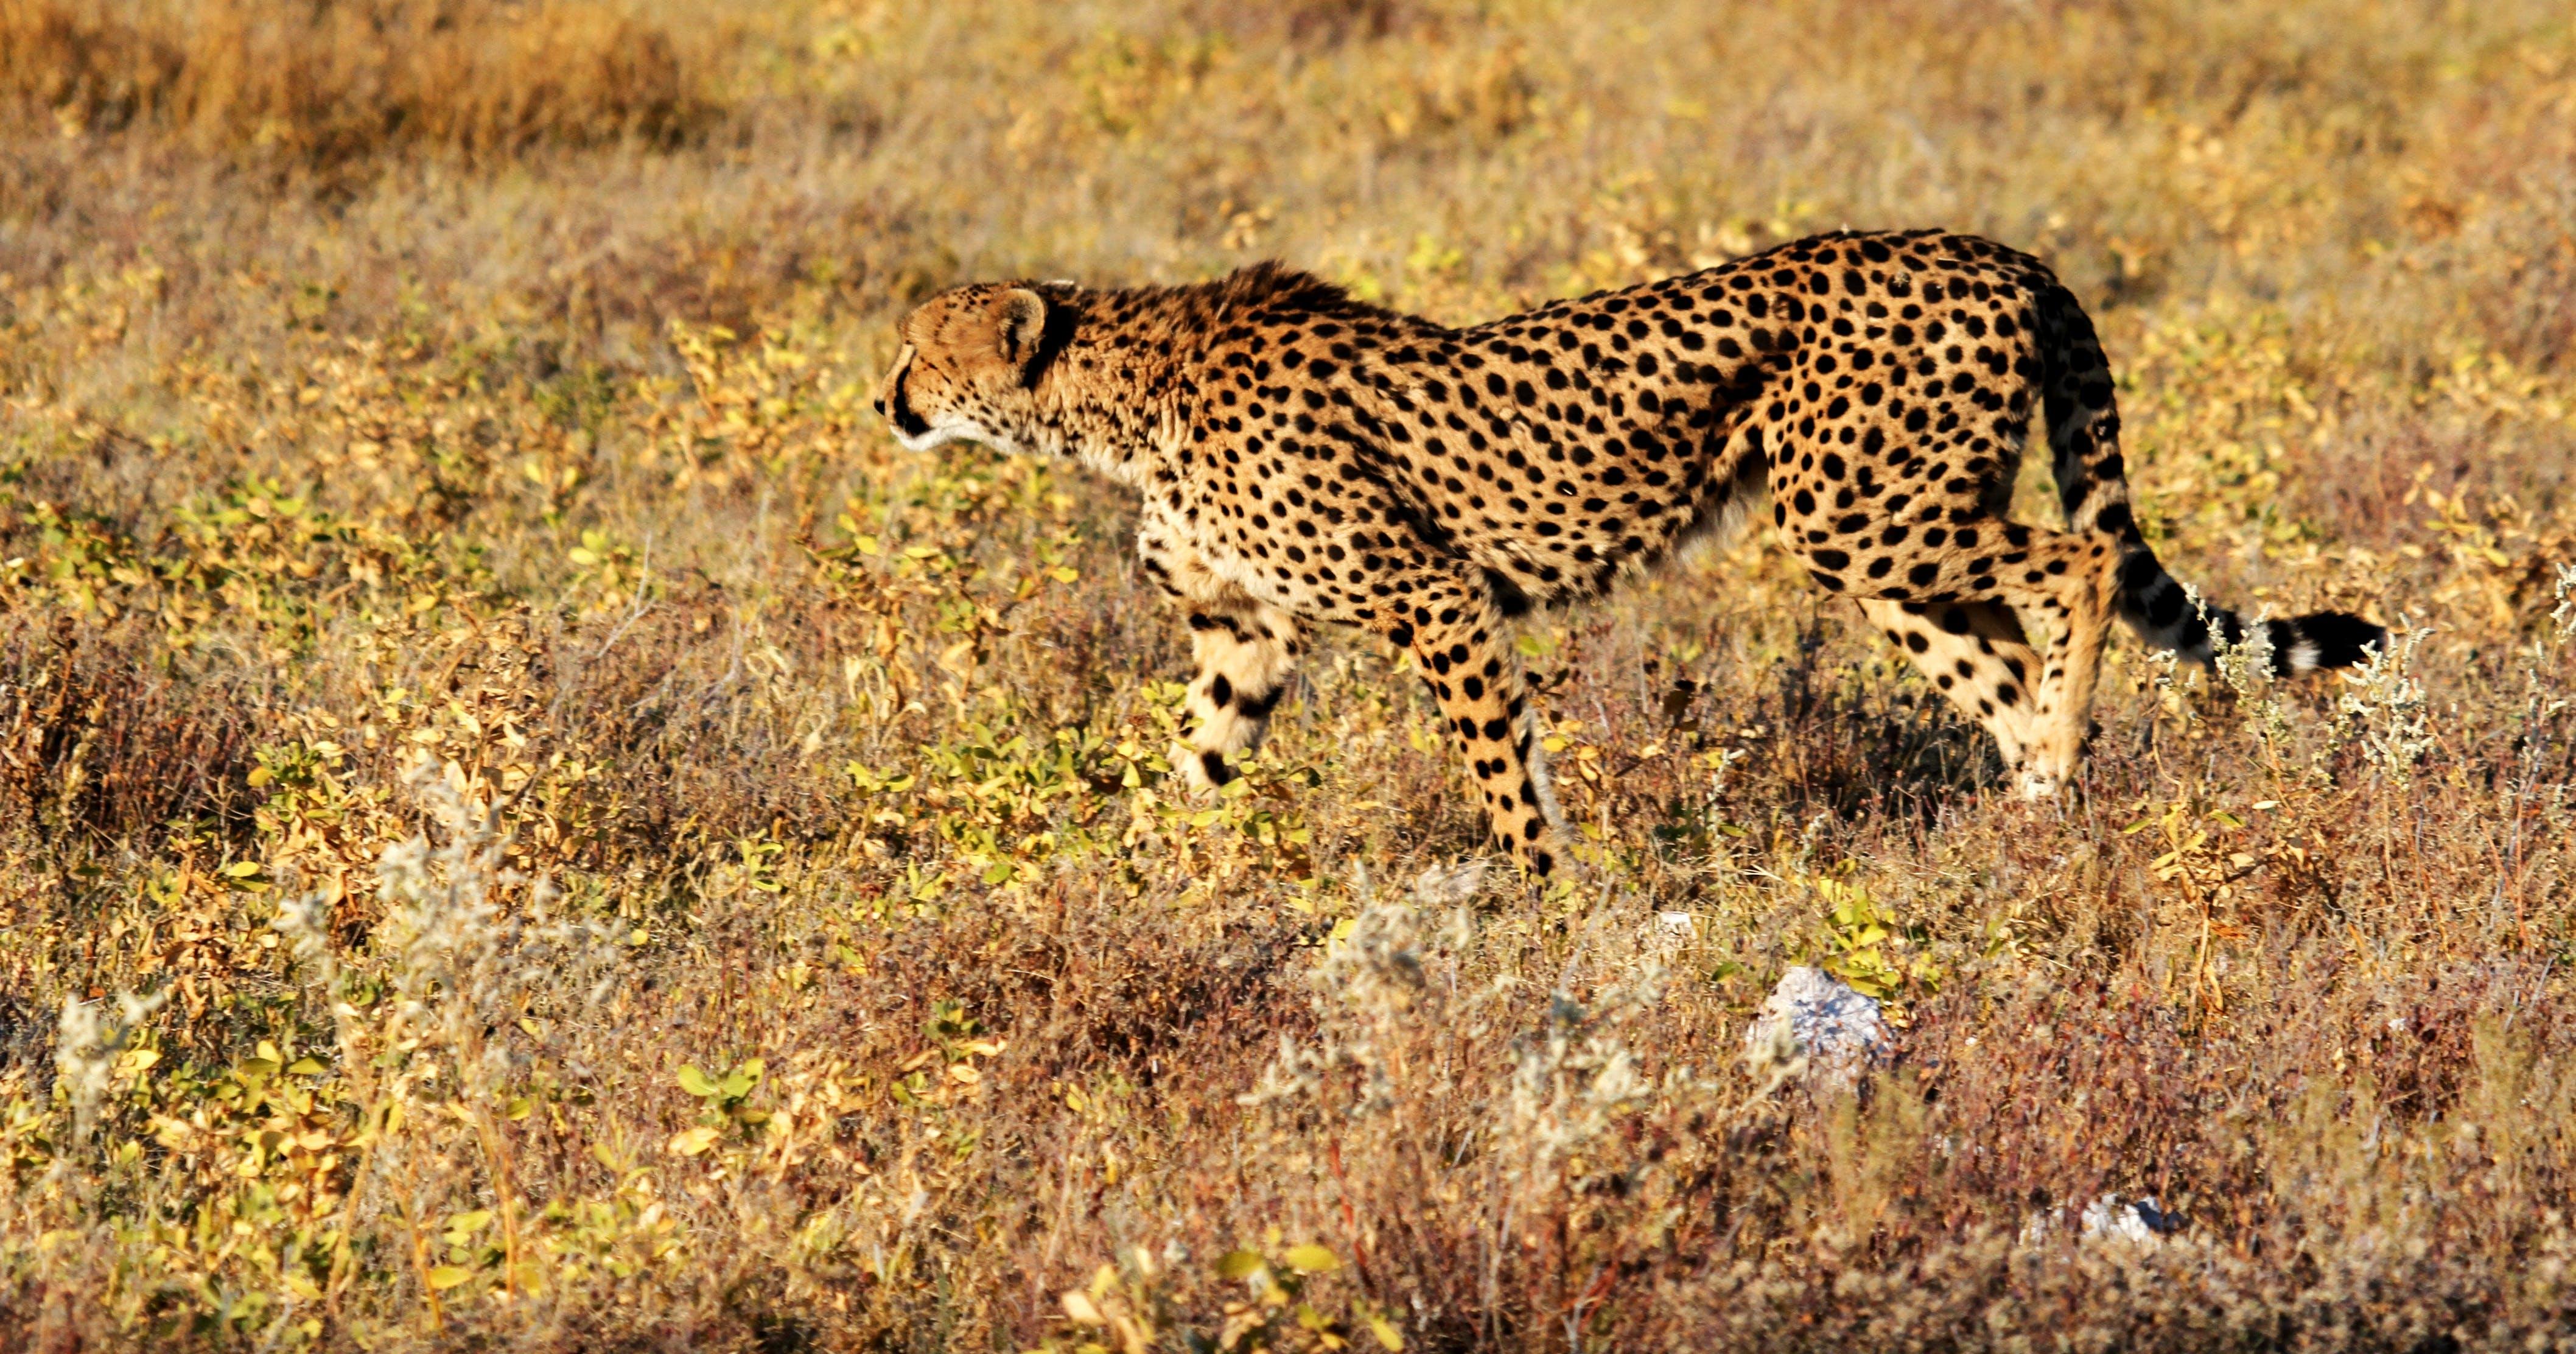 Cheetah Walking on Grass